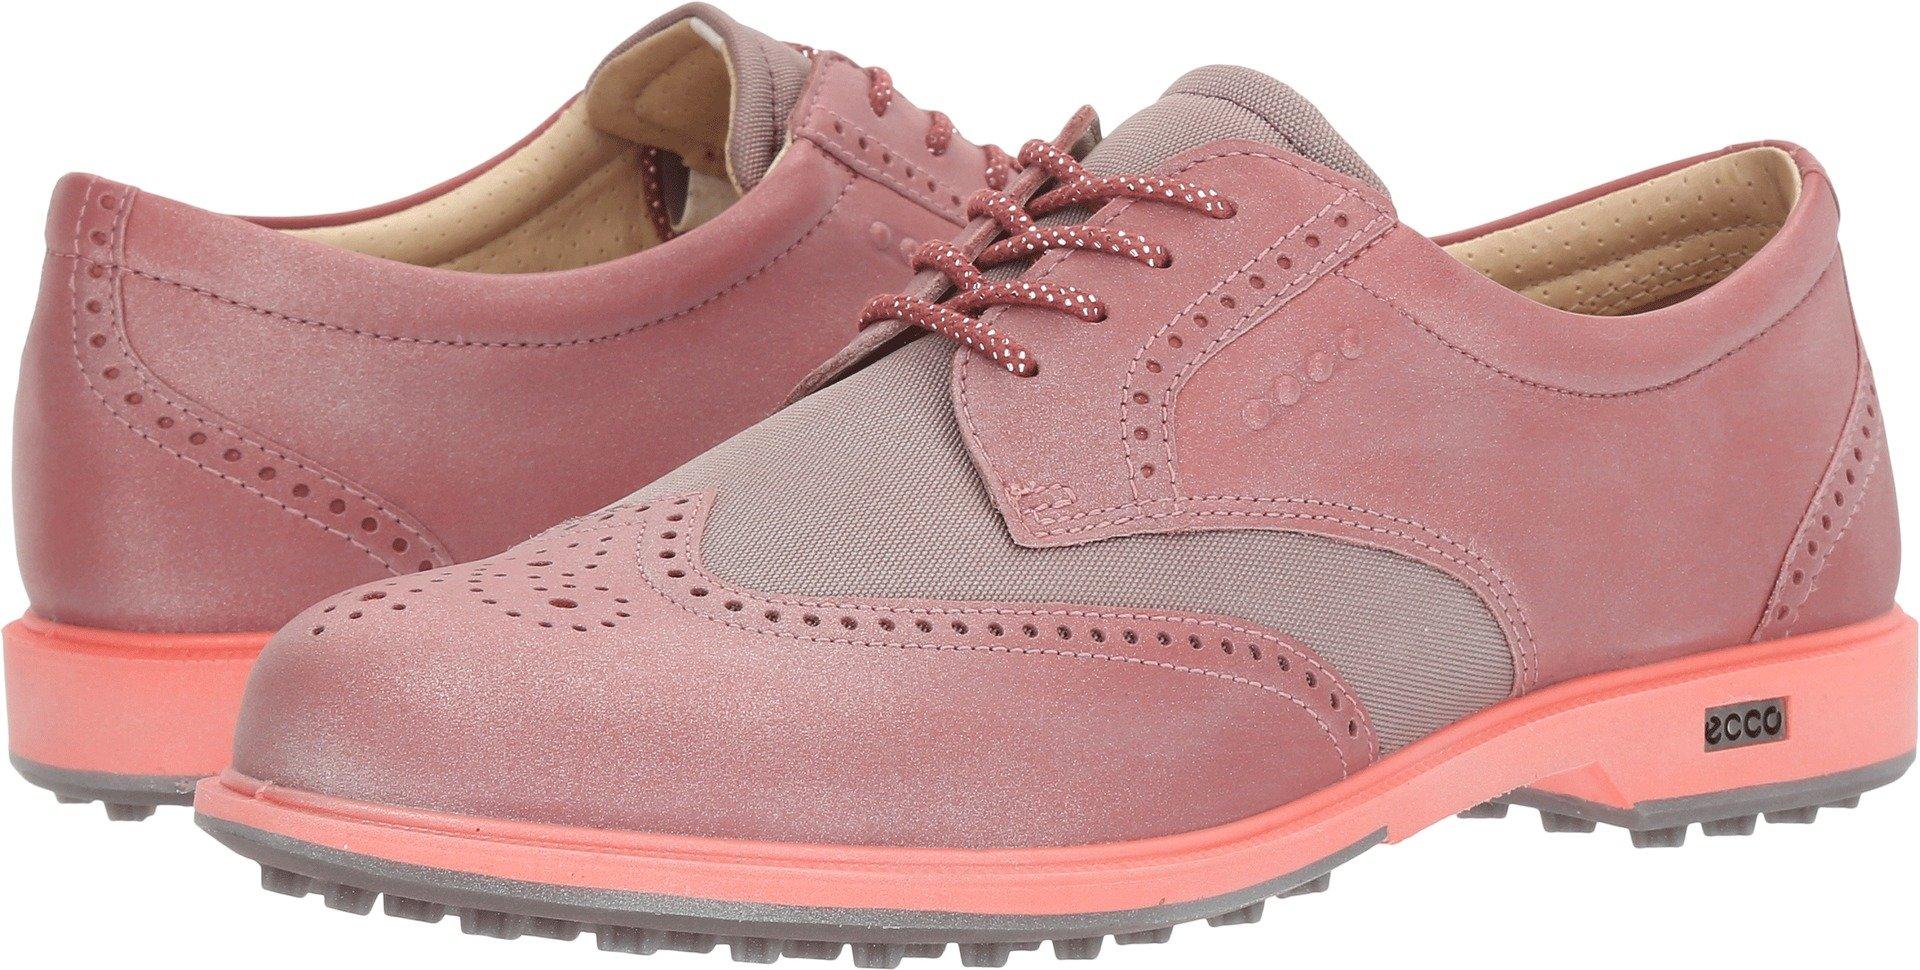 ECCO Women's Classic Hybrid III Golf Shoe, Petal/Petal Trim, 41 EU/10-10.5 M US